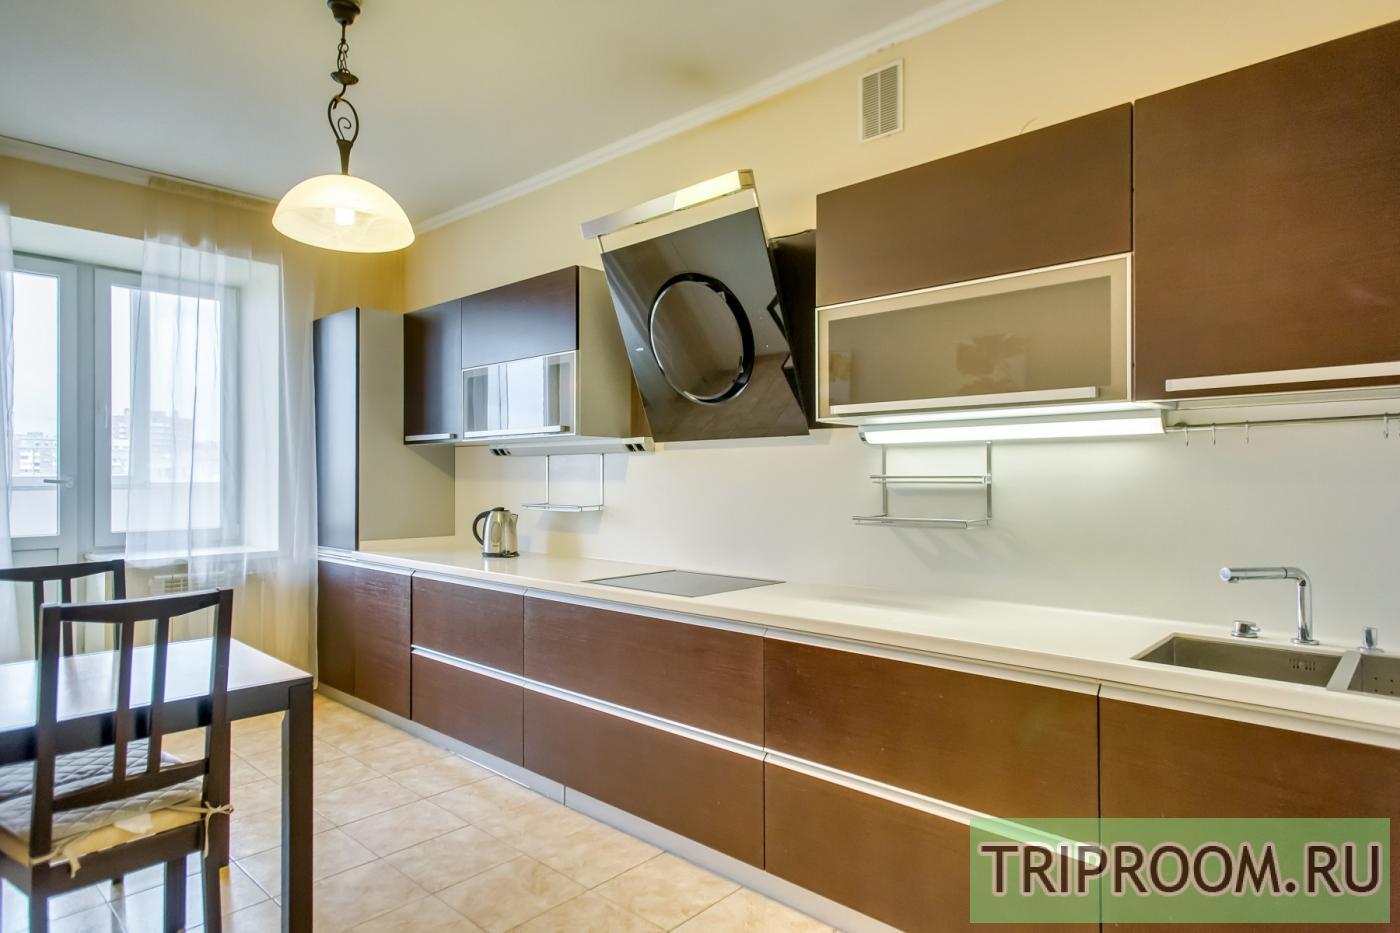 2-комнатная квартира посуточно (вариант № 23730), ул. Максима Горького улица, фото № 20